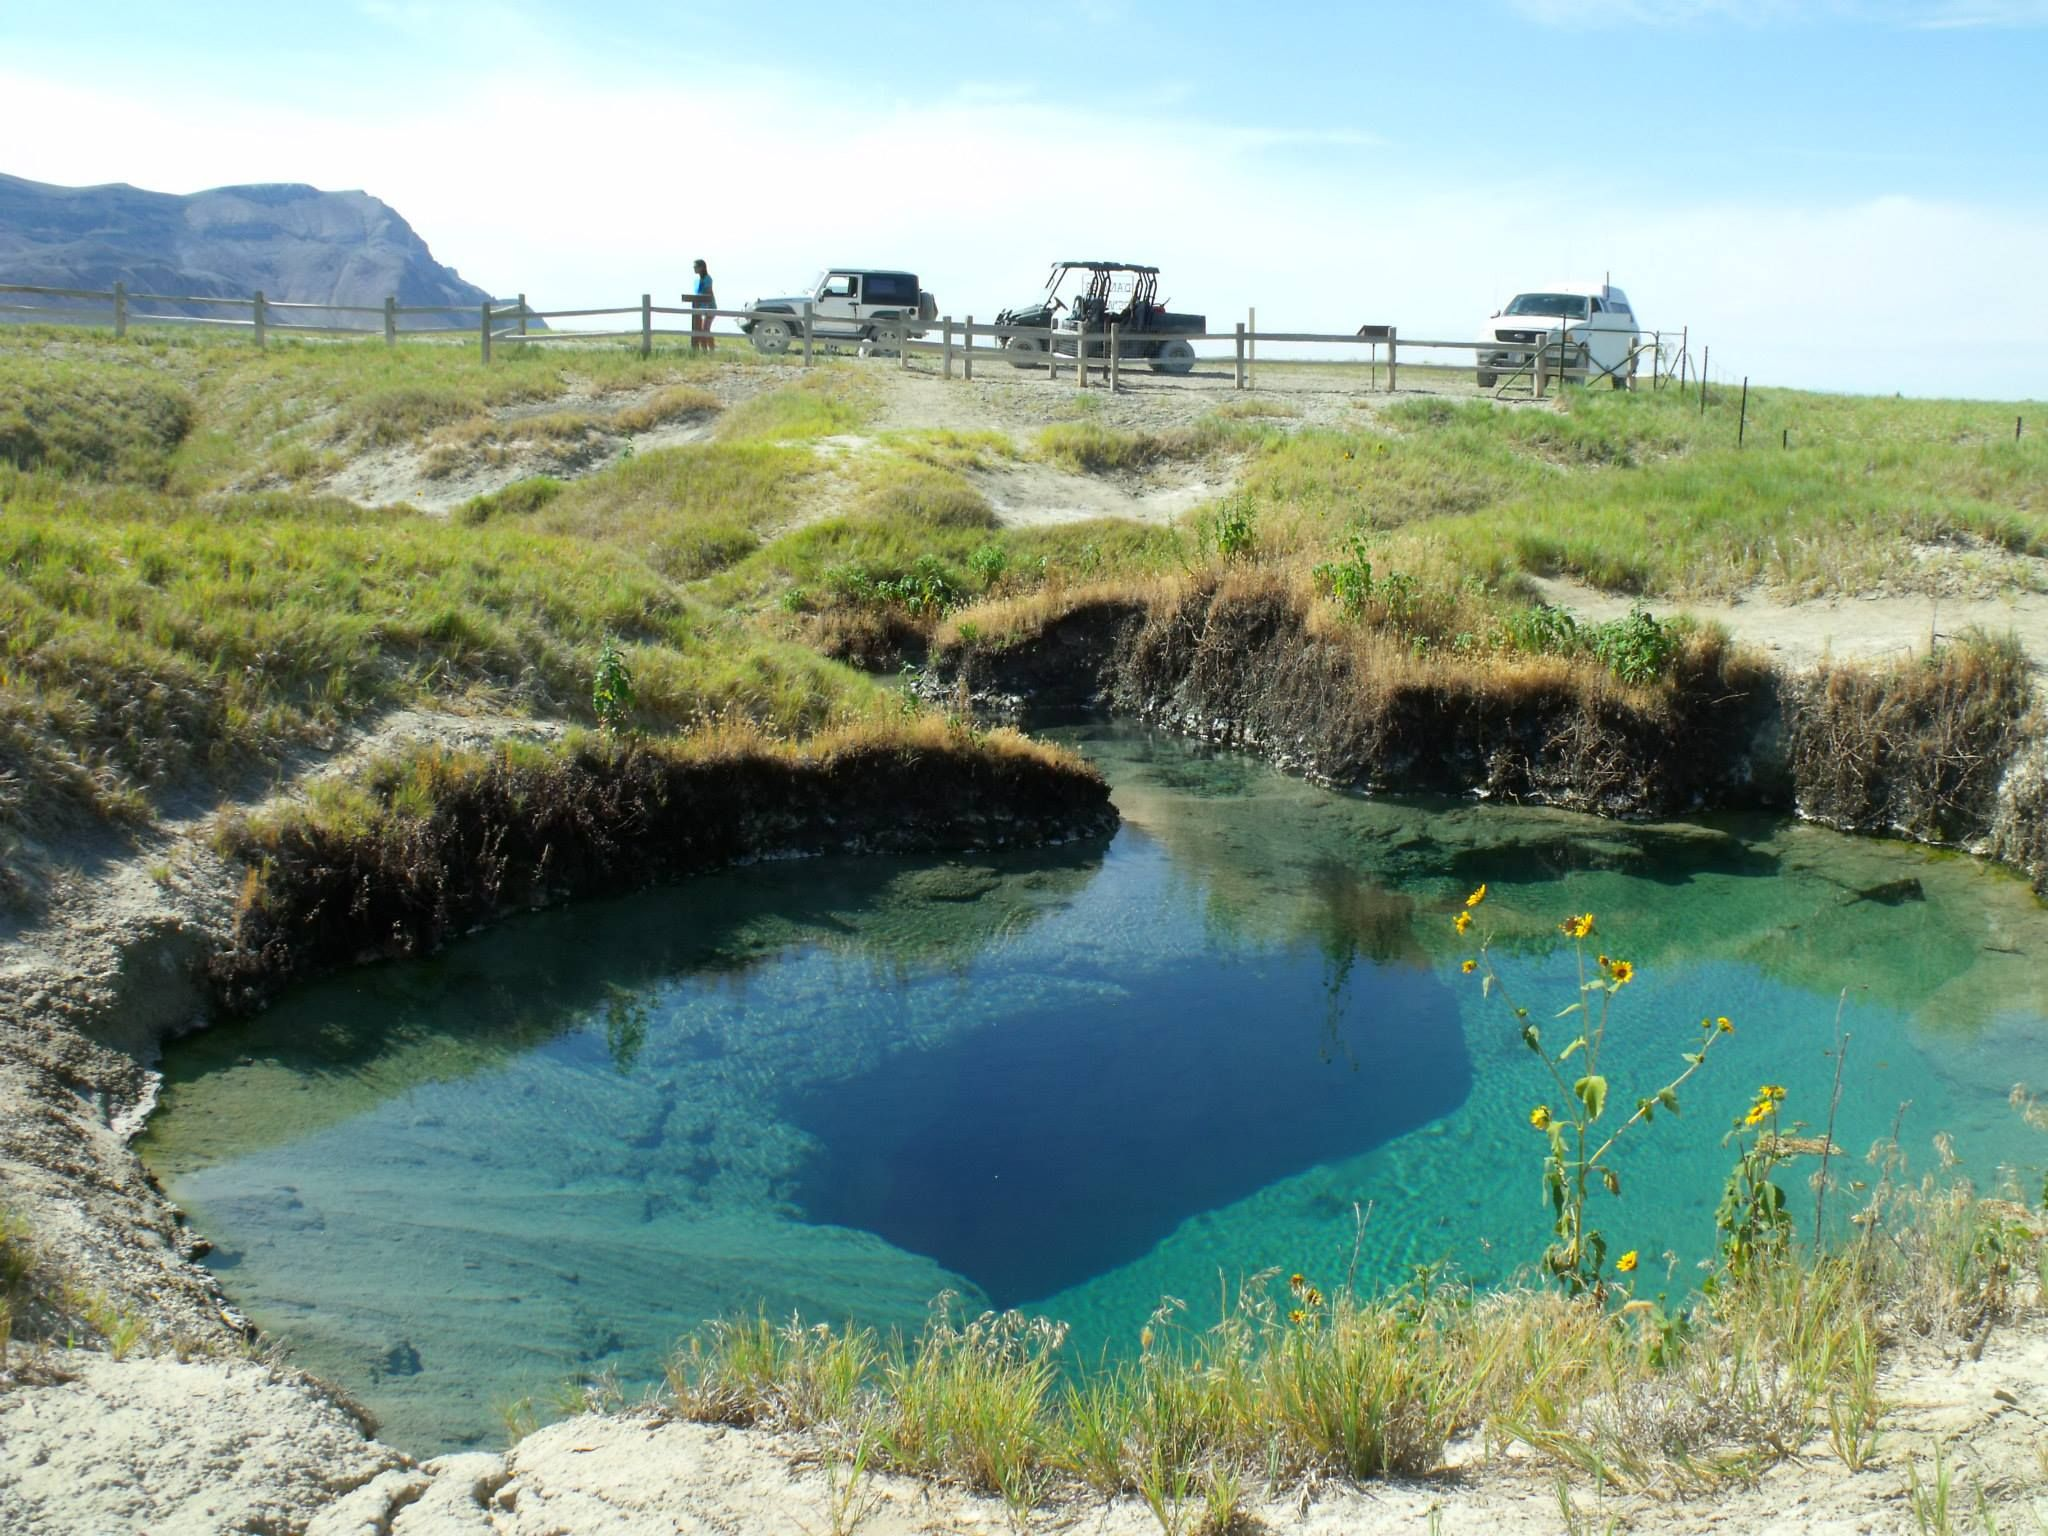 19 Natural Hot Springs in Nevada - Flavorverse